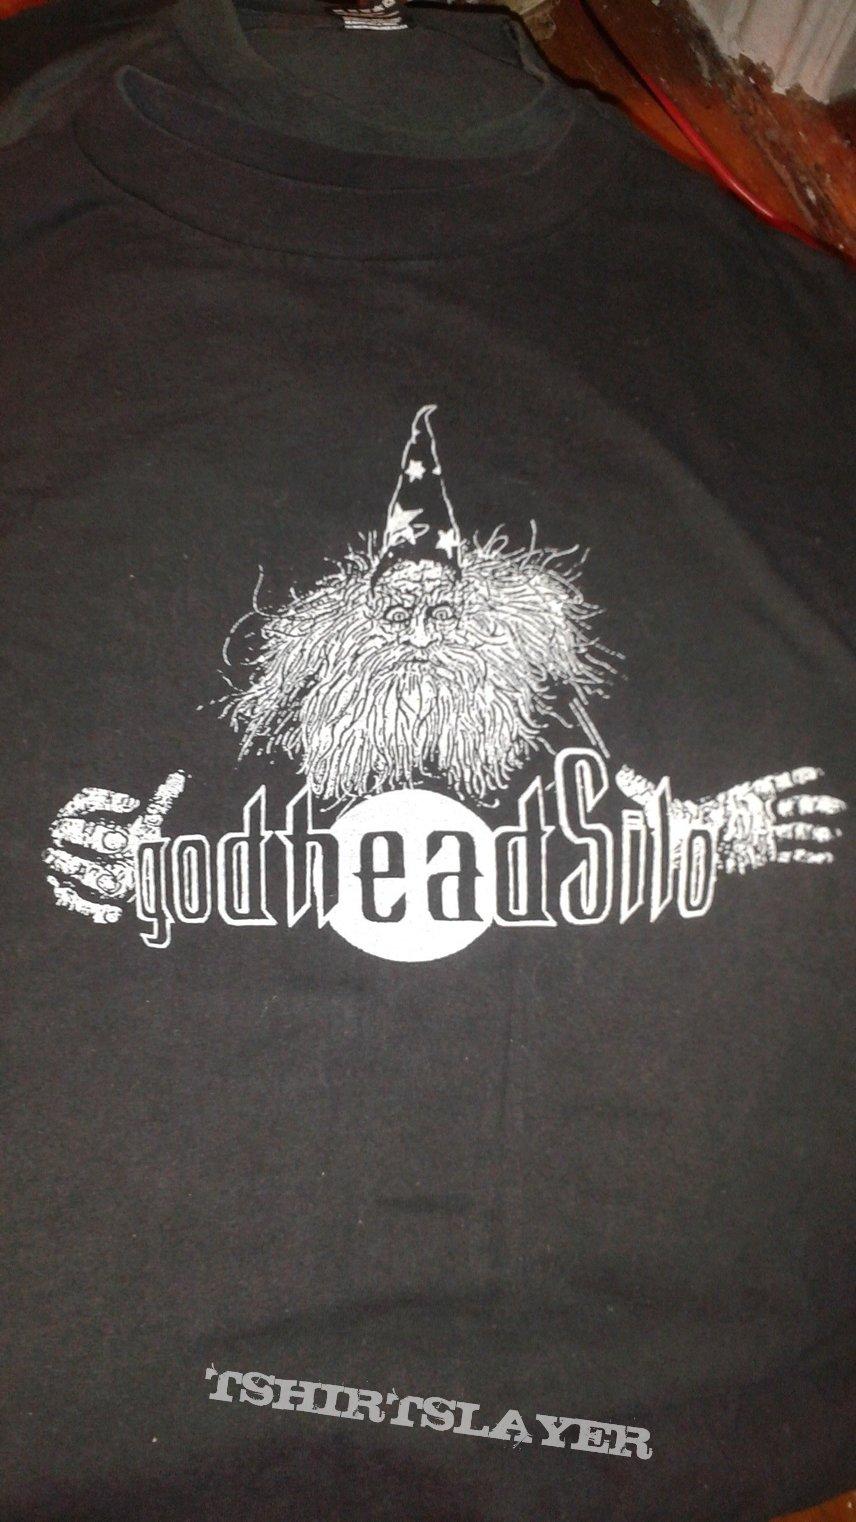 Godheadsilo glow in the dark wizard t-shirt.